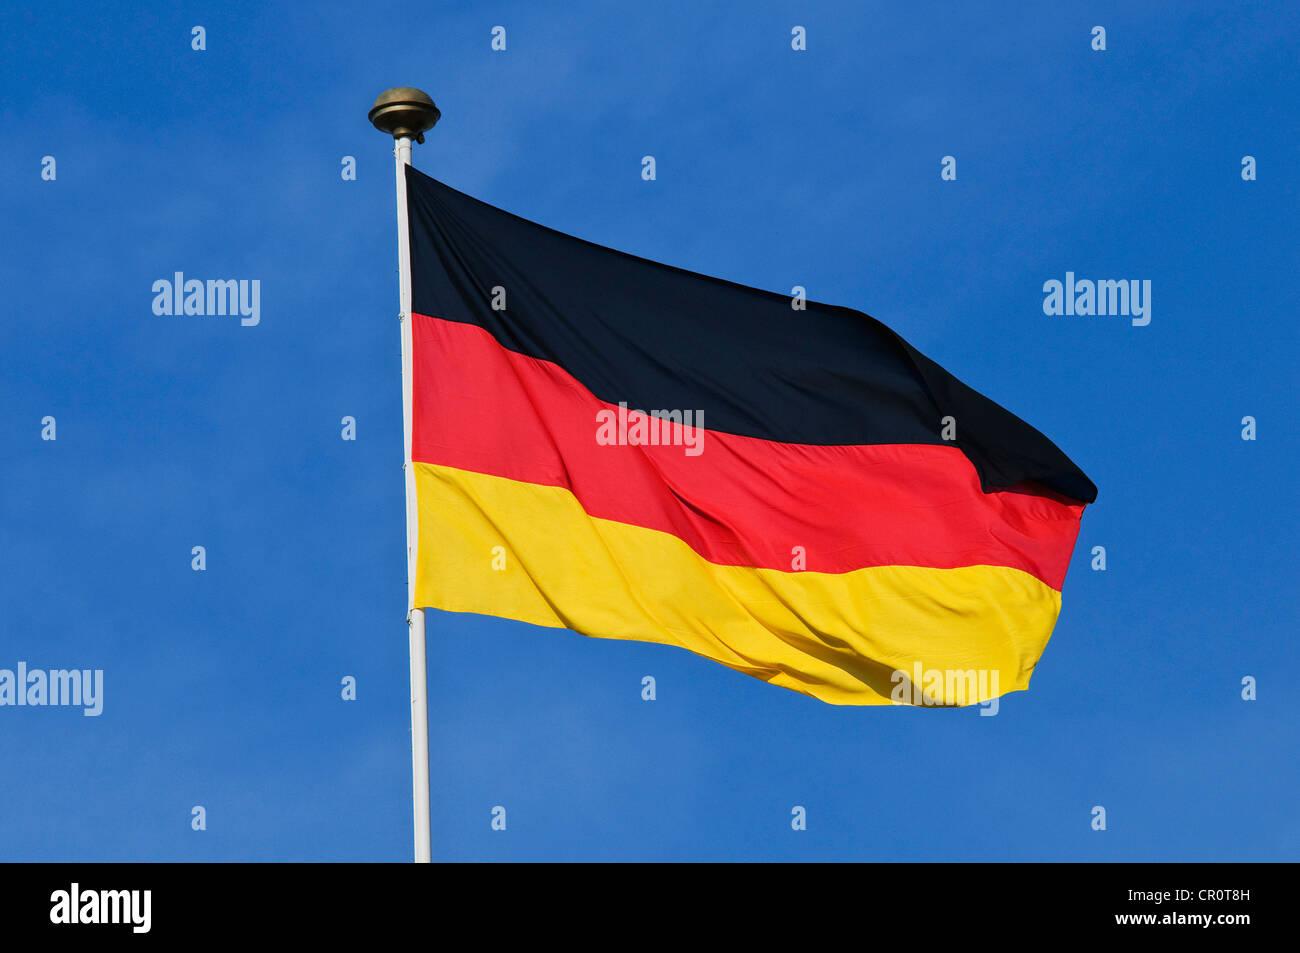 German national flag against blue sky - Stock Image